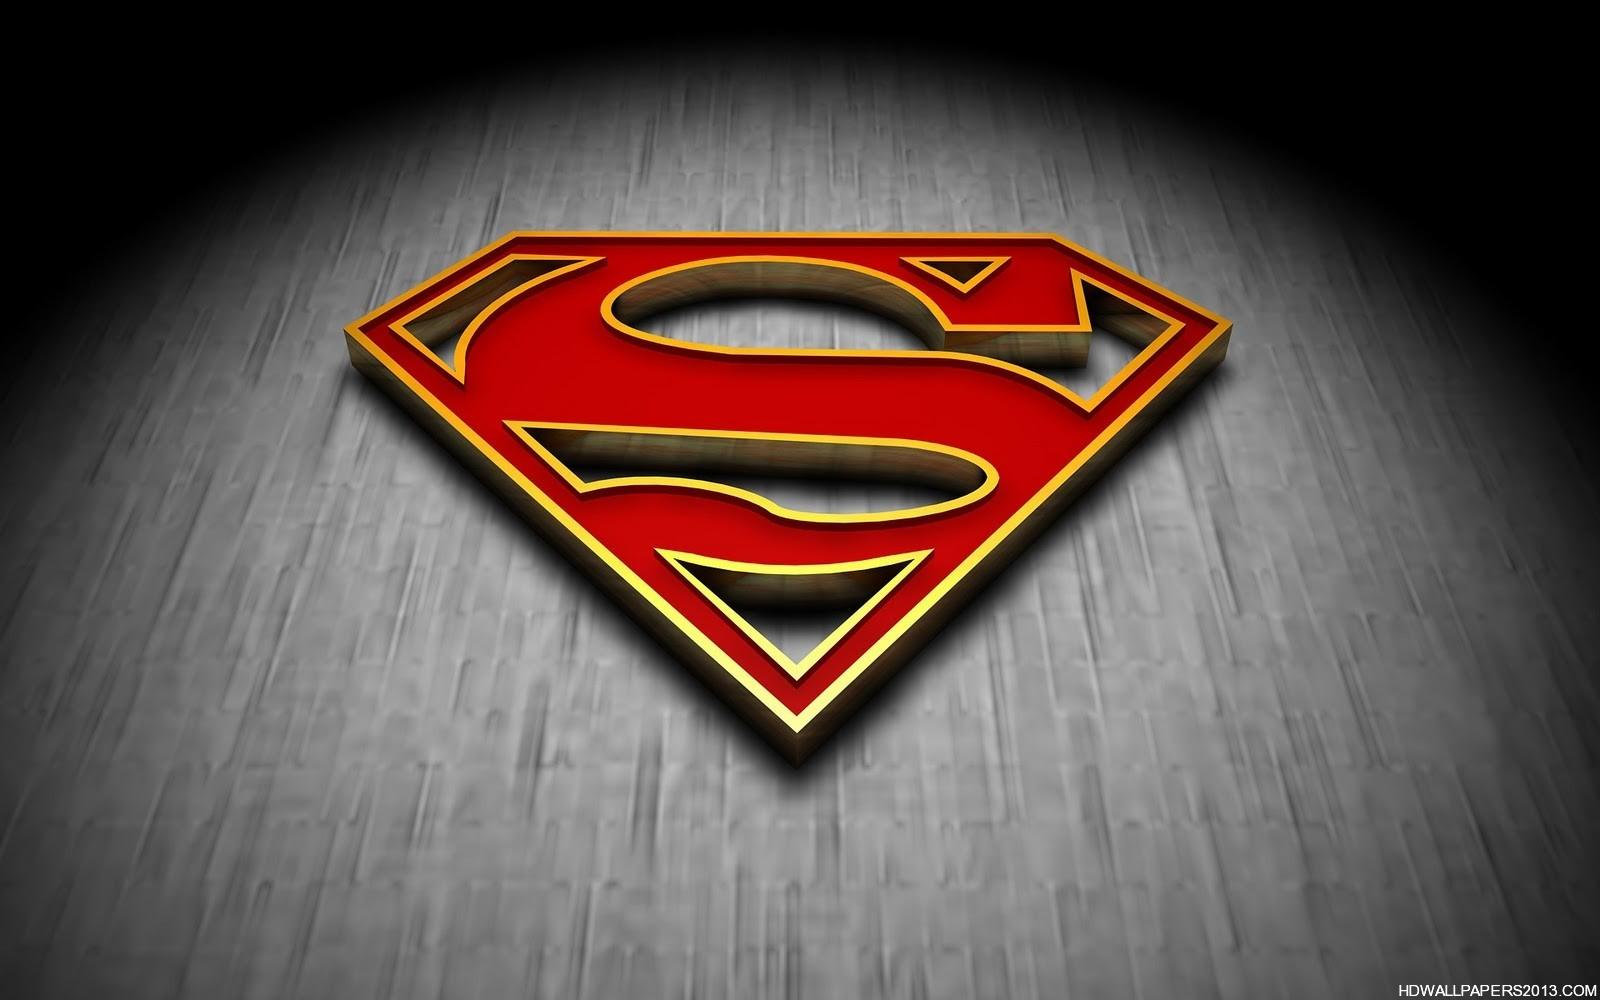 Hd wallpaper logo - Logo Superman Hd Hd Wallpapers Logo Superman Hd Hd Backgrounds